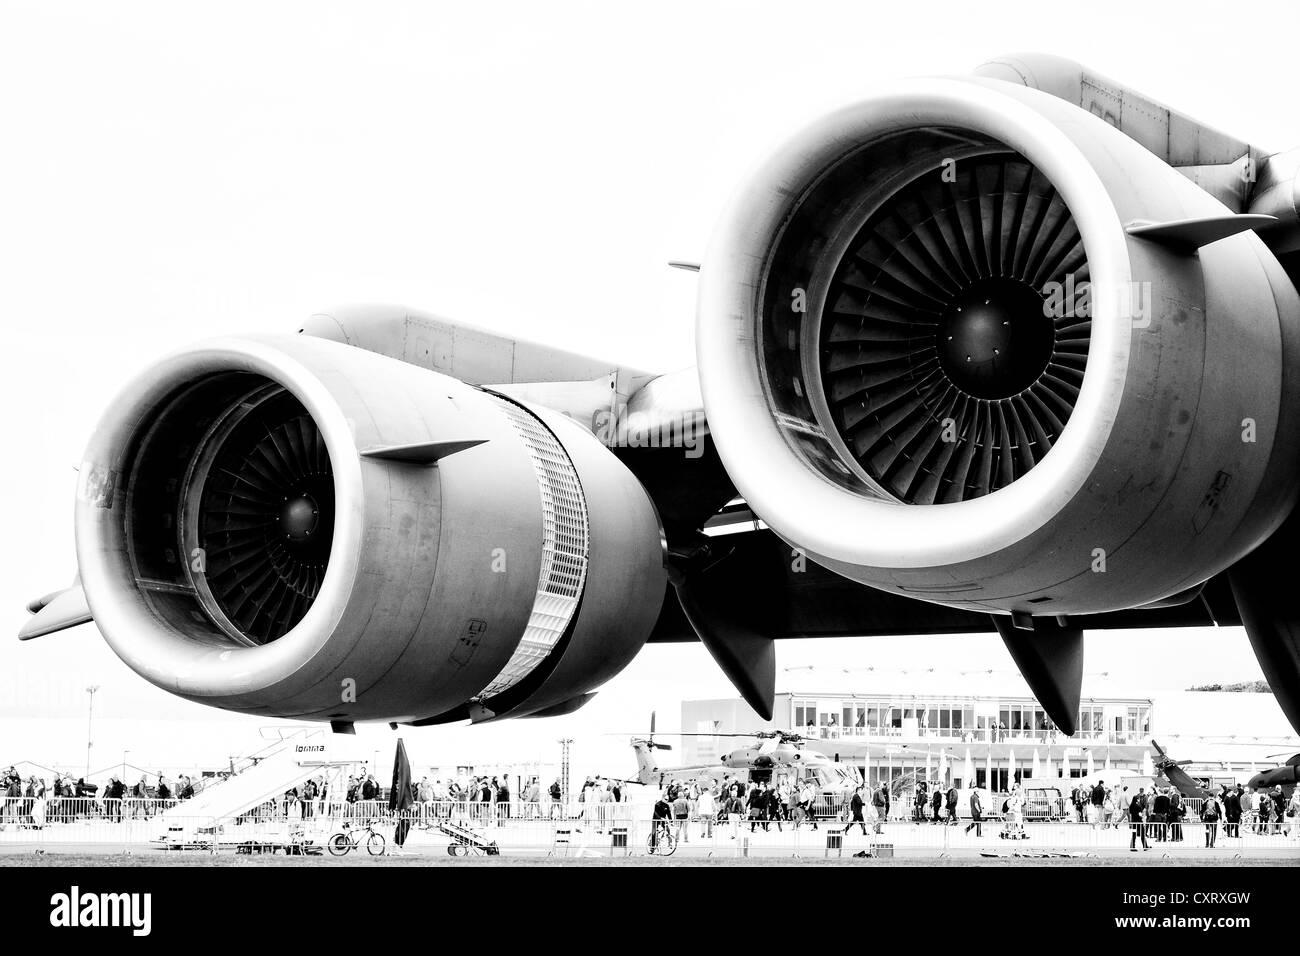 Motori Boeing C-17 Globemaster (bianco e nero) Immagini Stock